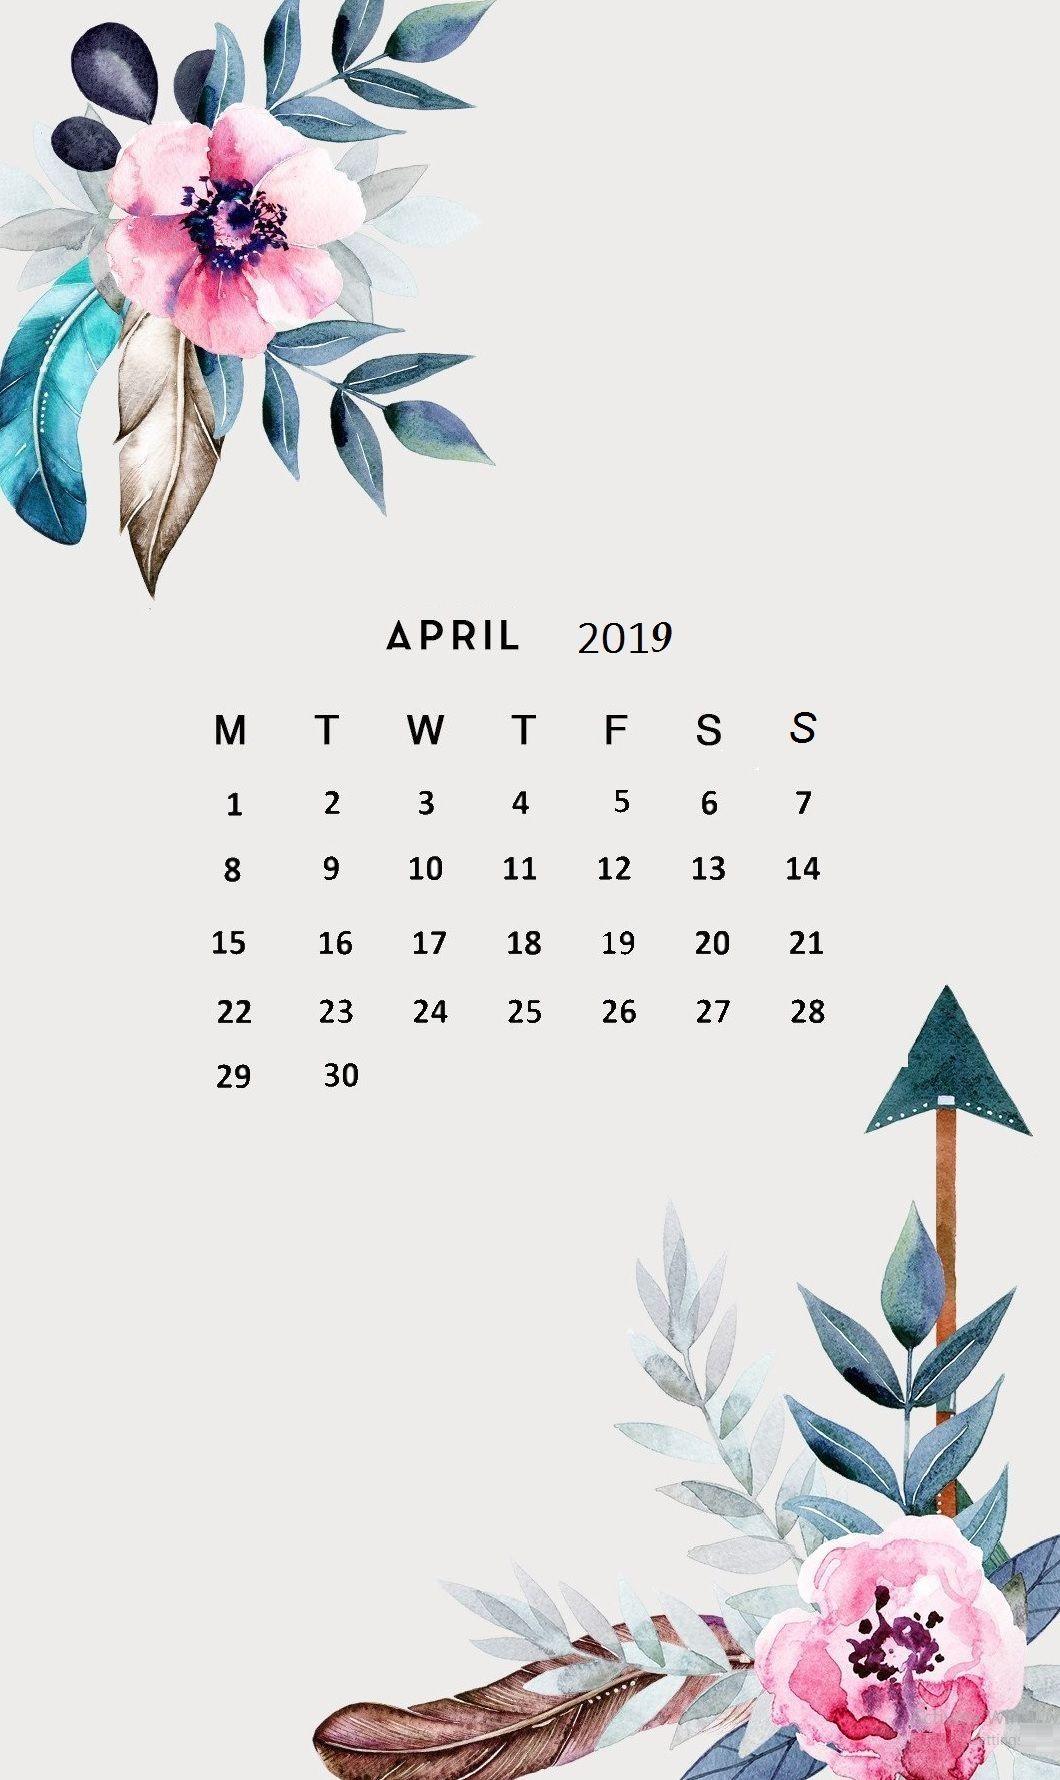 Flower April 2019 Iphone Wallpaper Calendar Background in 2019 1060x1780